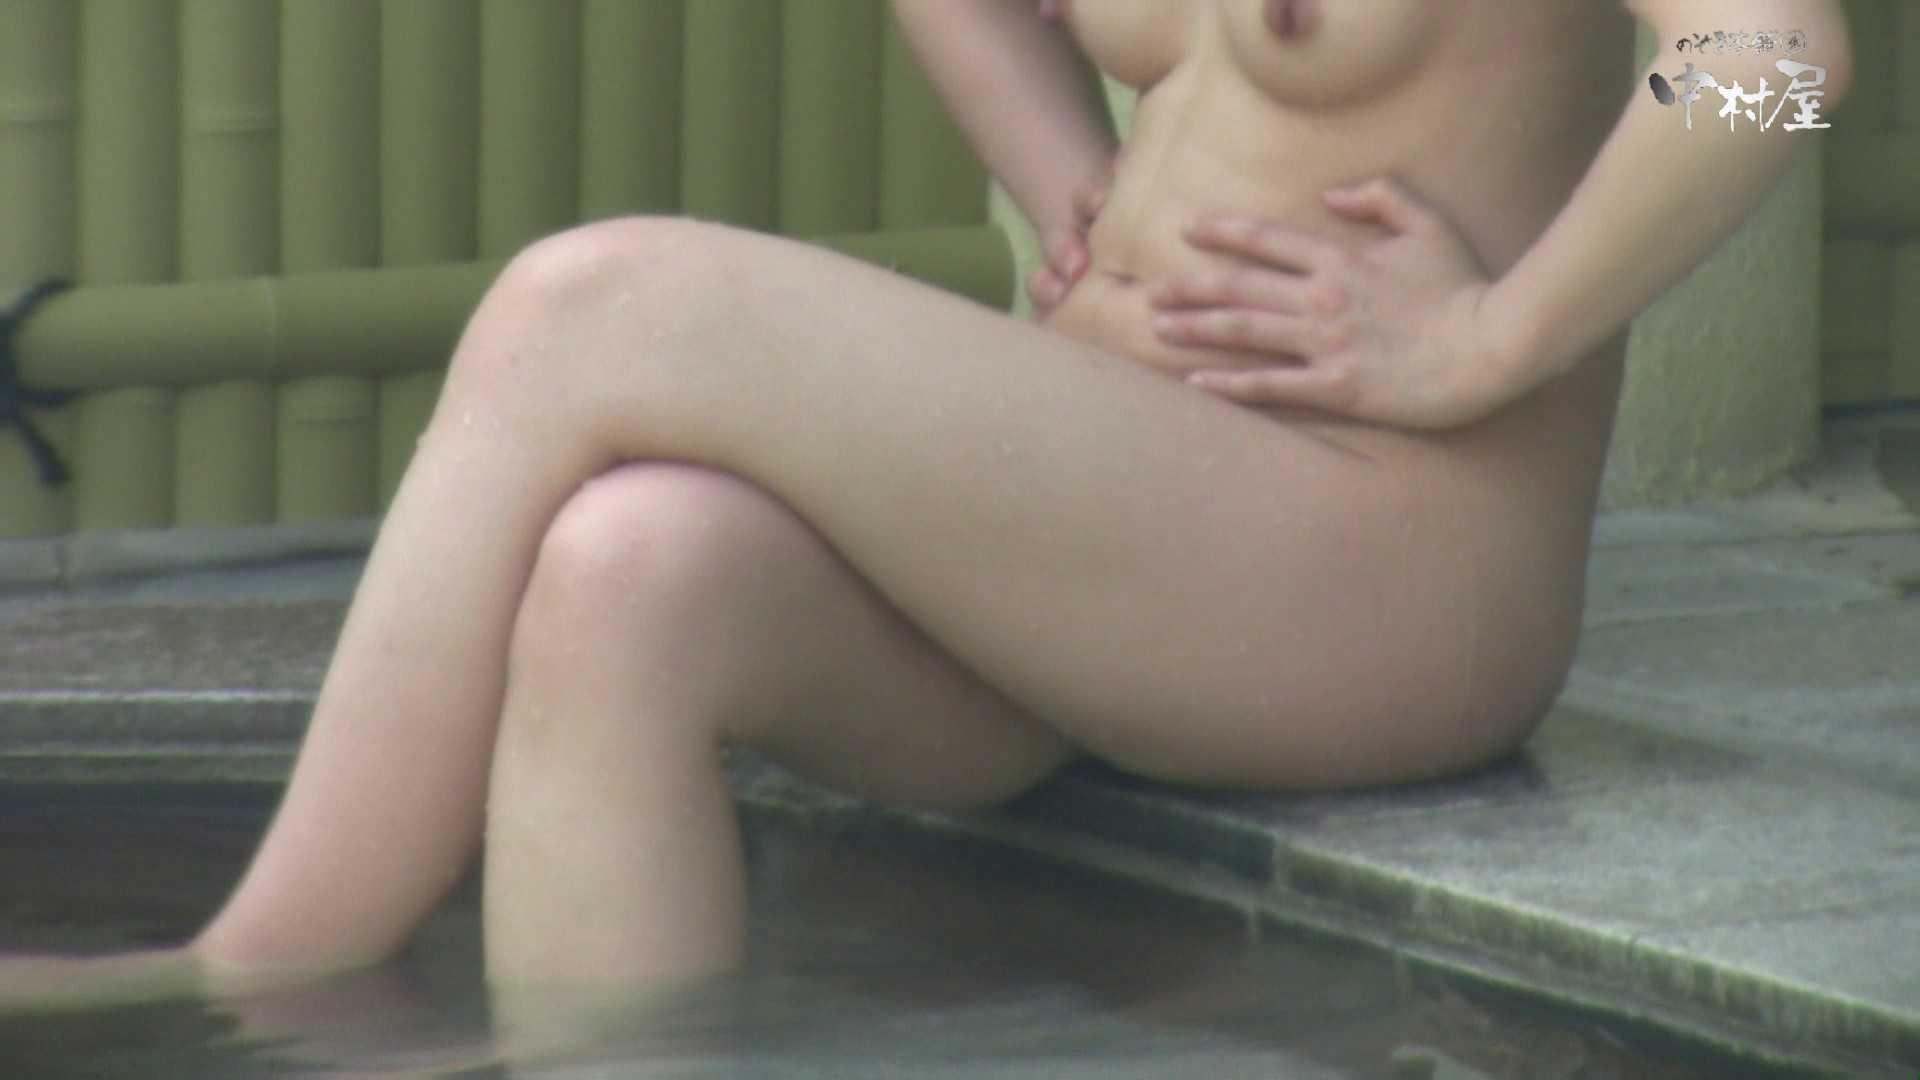 Aquaな露天風呂Vol.888 OLセックス   露天  77画像 61